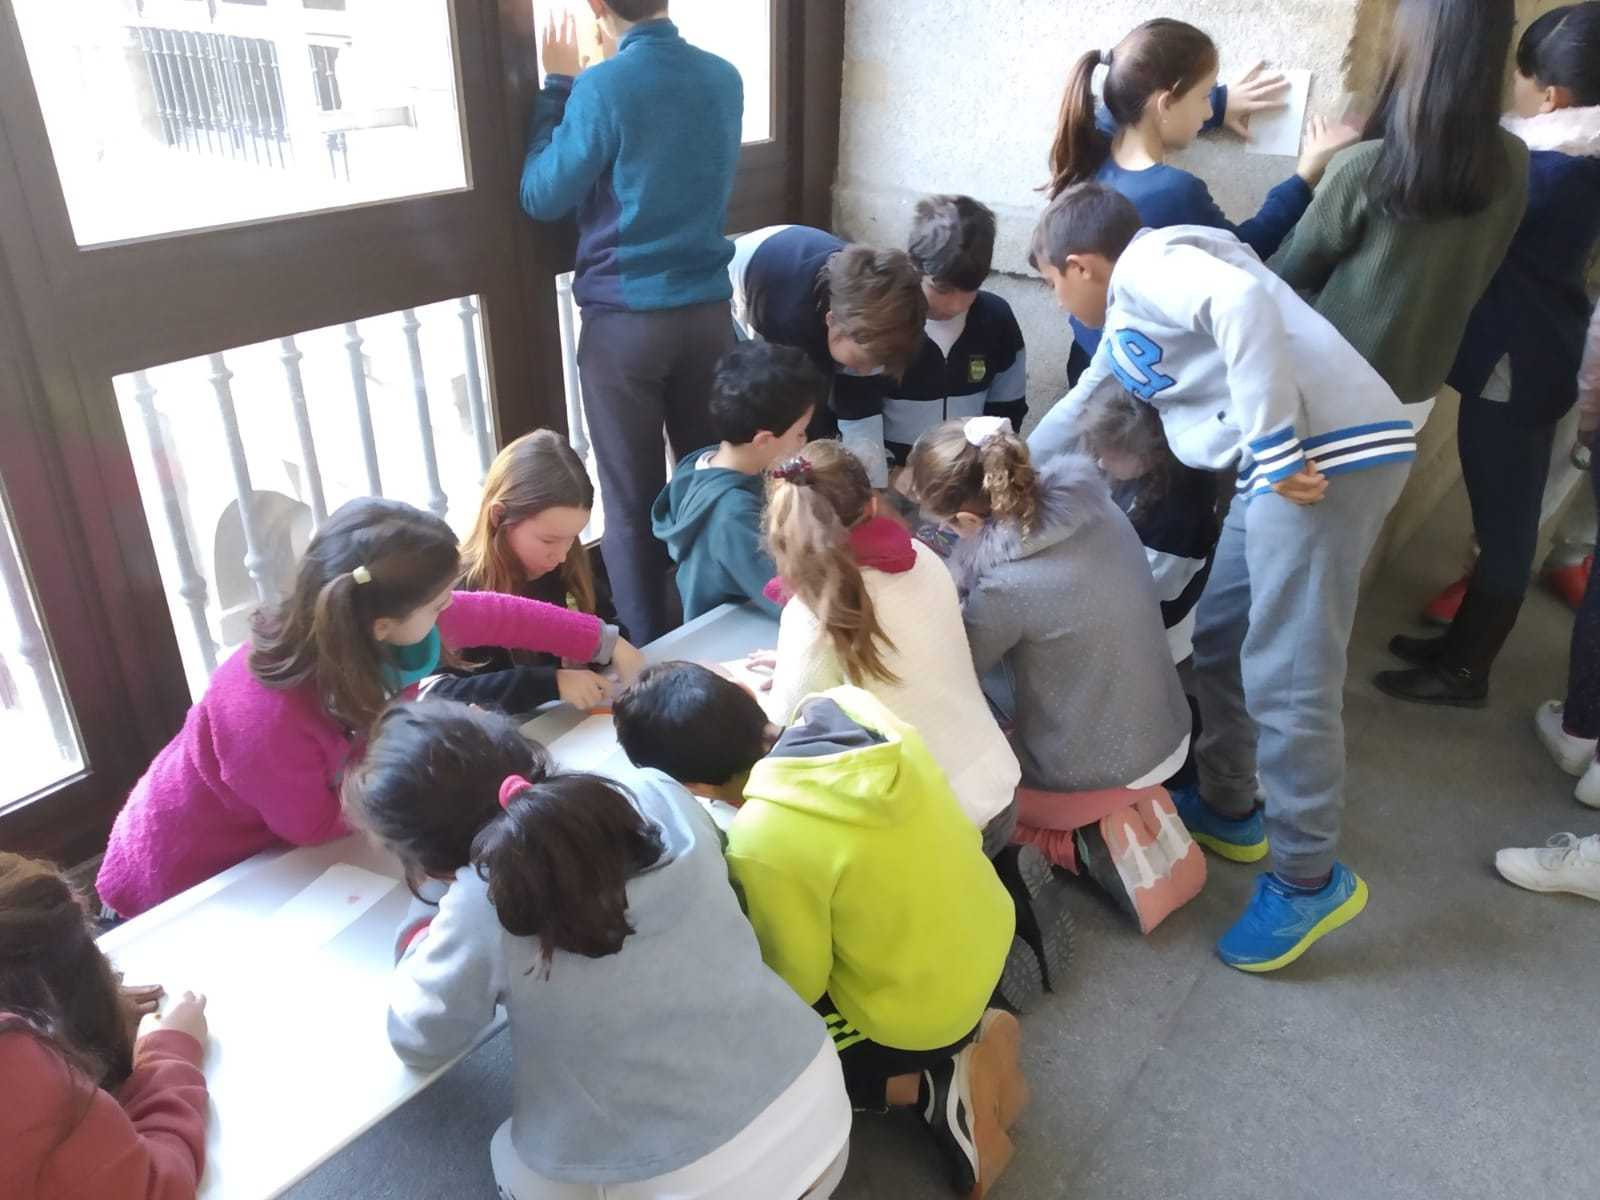 2019_02_07_Quinto visita Museo Reina Sofia_CEIP FDLR_Las Rozas 2